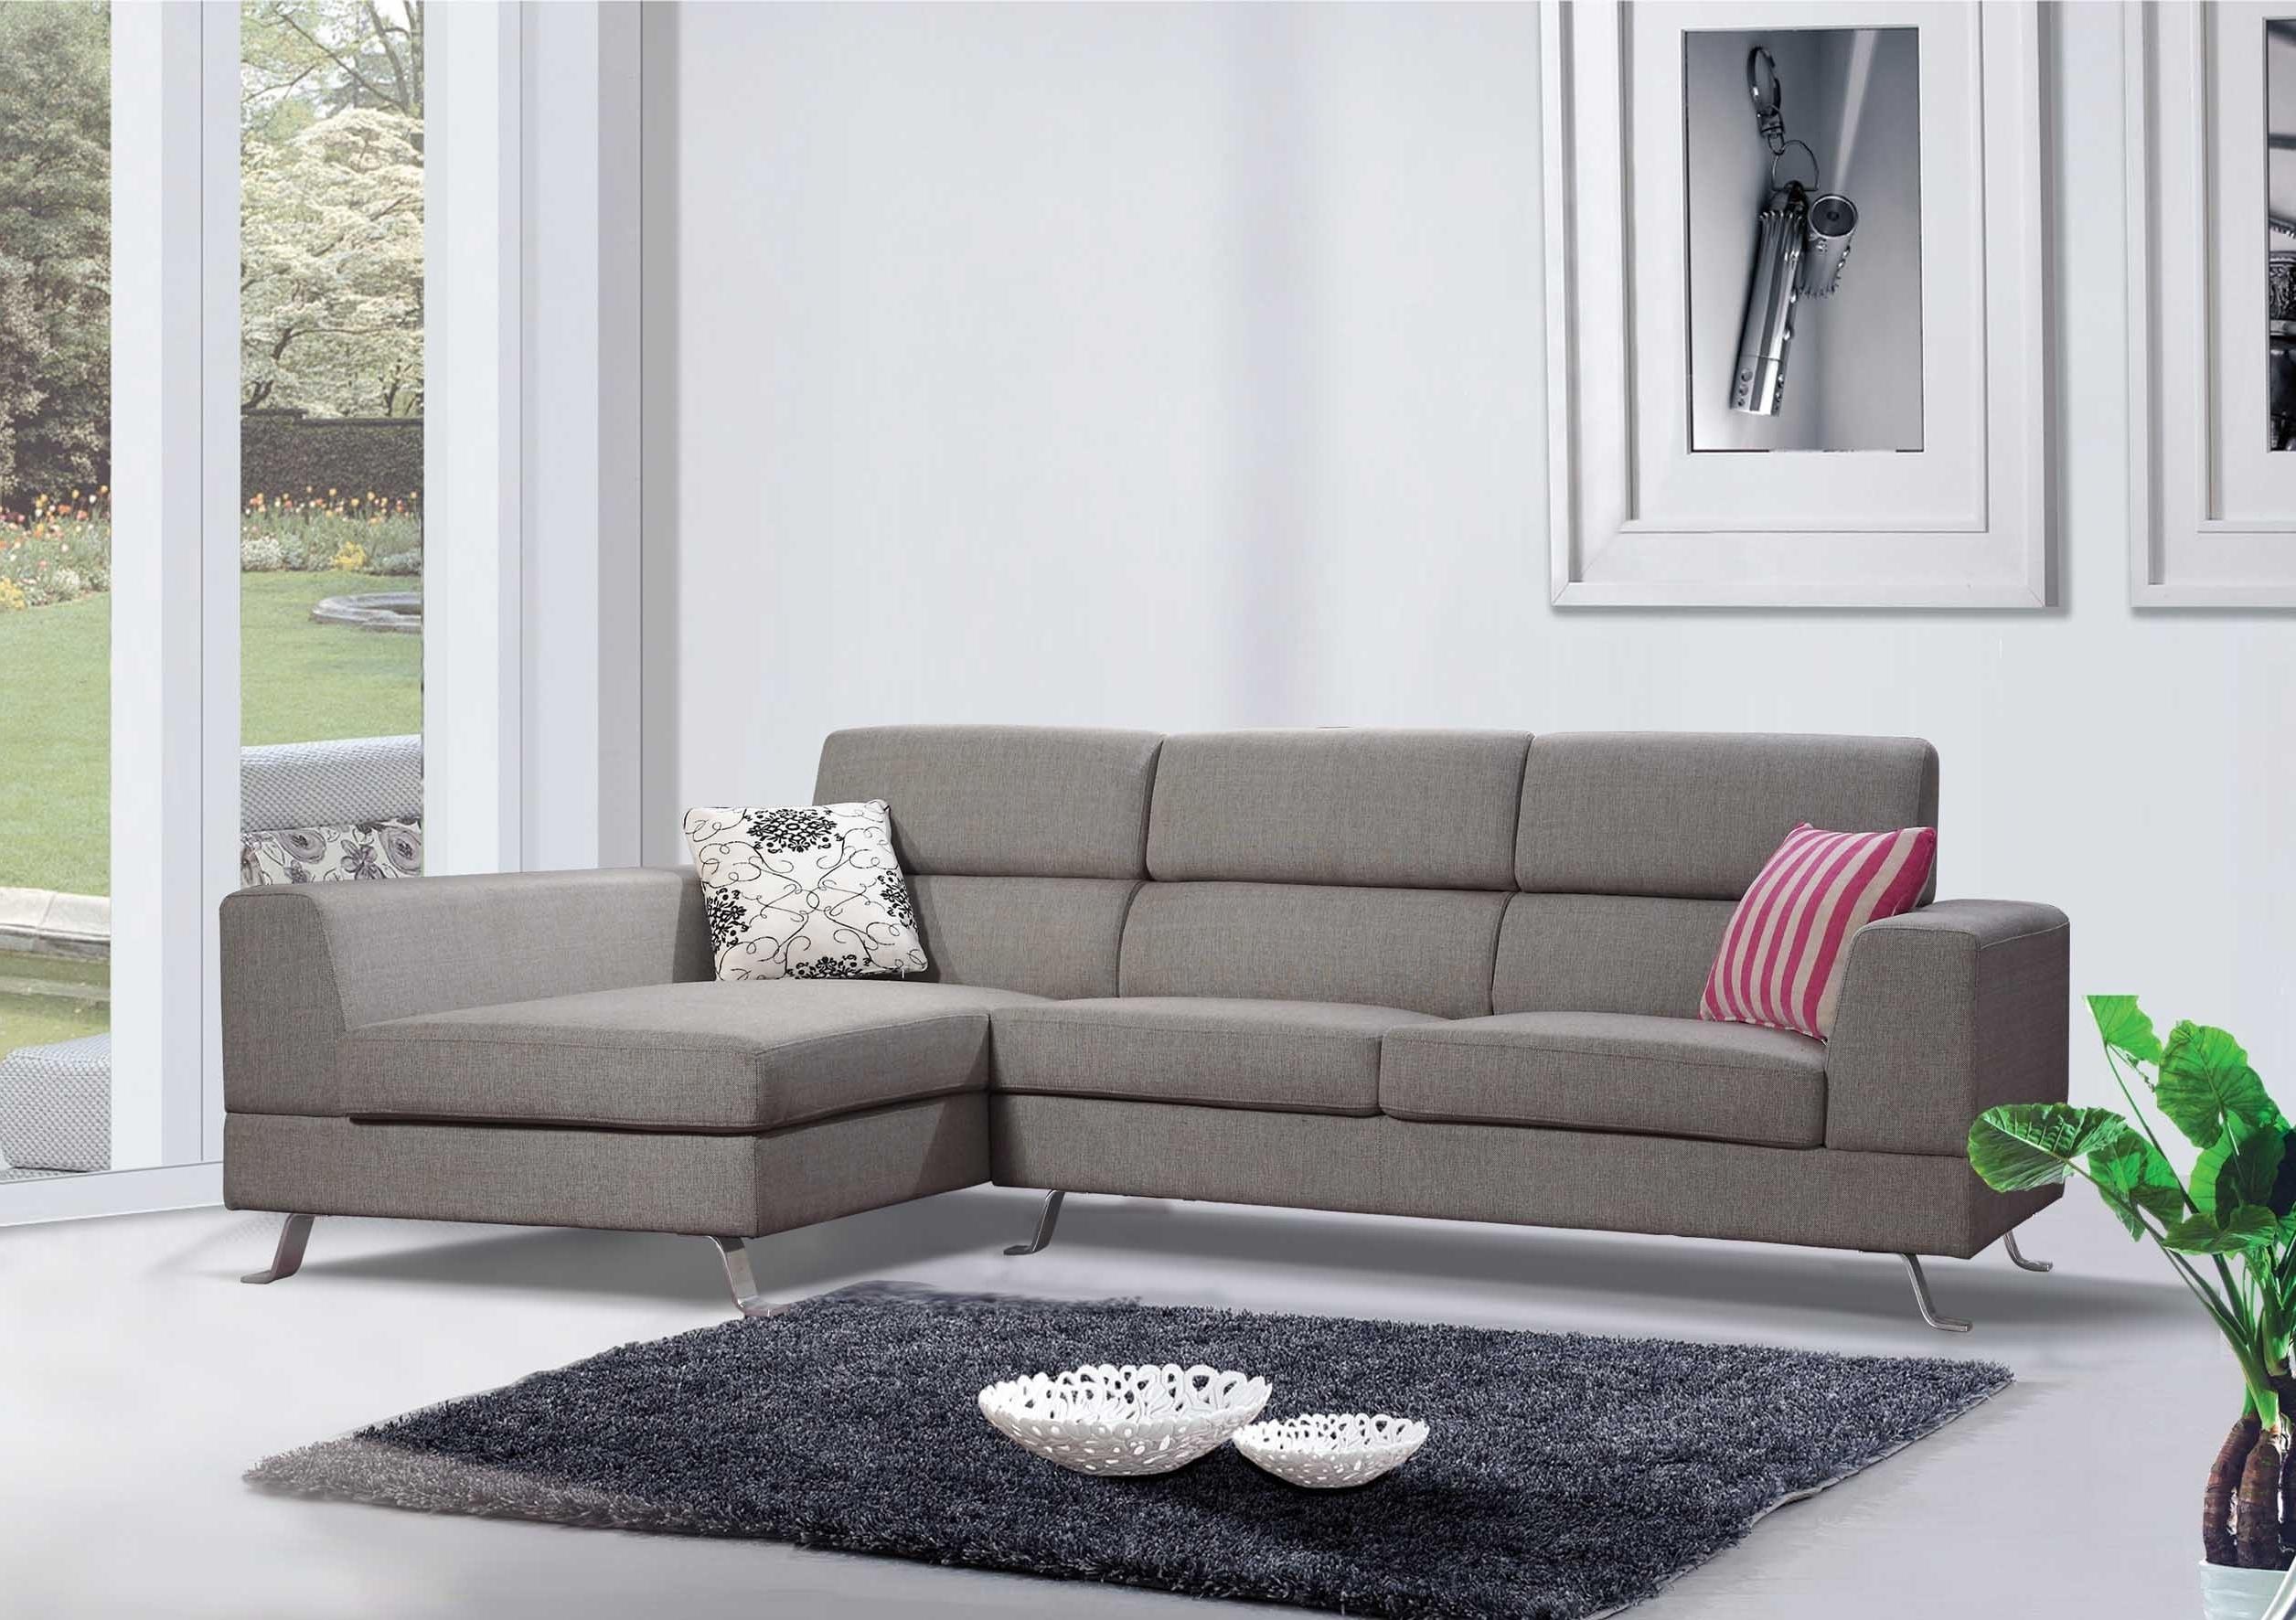 Kijiji Montreal Sectional Sofas regarding Well known Furniture : Sectional Sofa 96X96 Sectional Sofa European Style